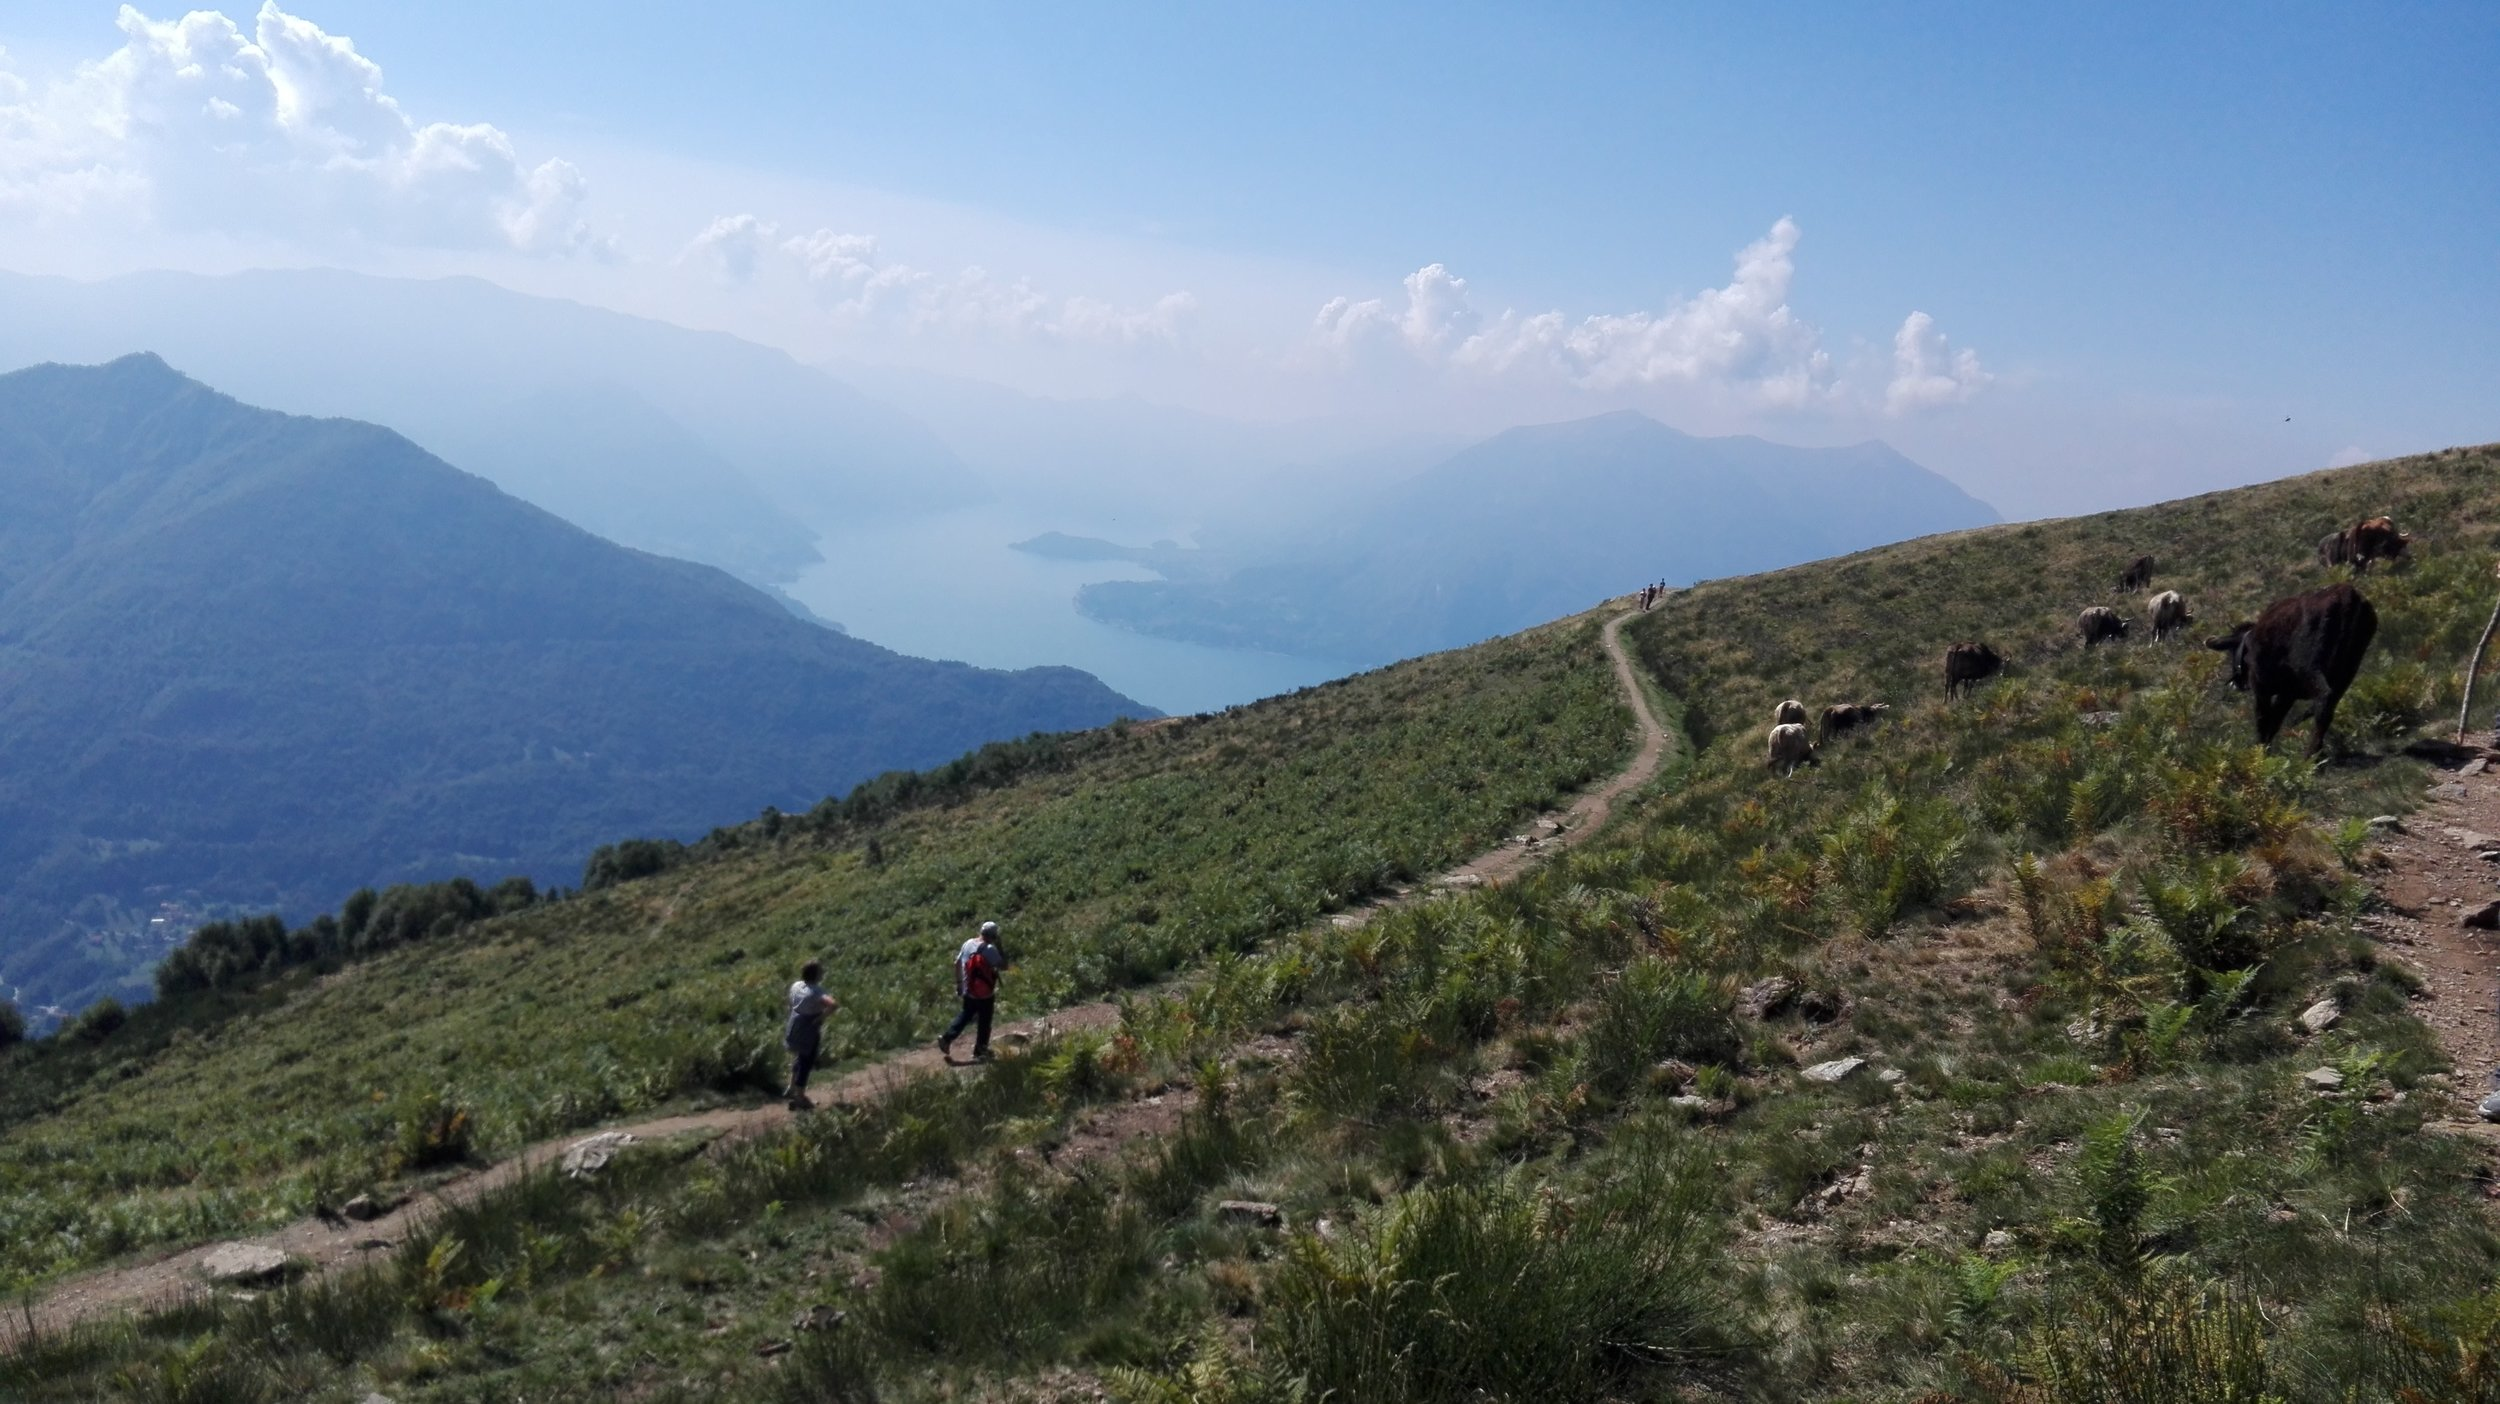 Hikingcomolake_crocedimuggio1.jpg